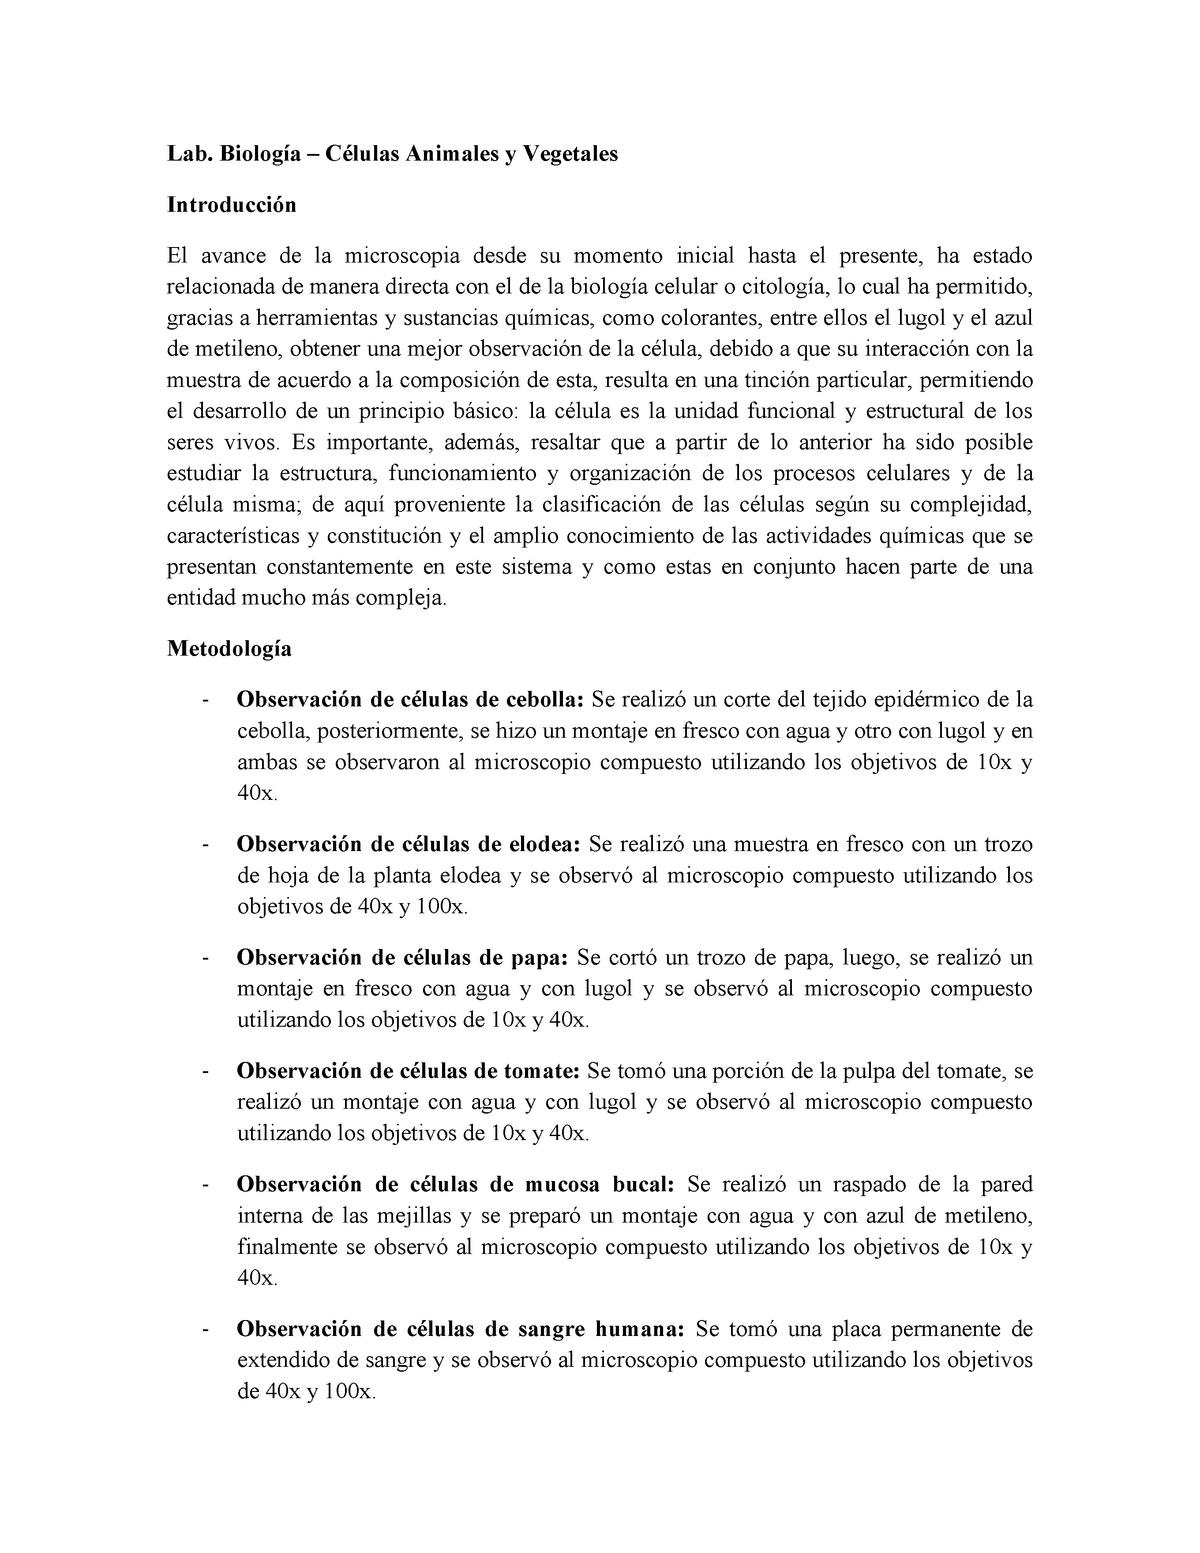 Informe Celulas Animales Y Vegetales 783 Udea Studocu